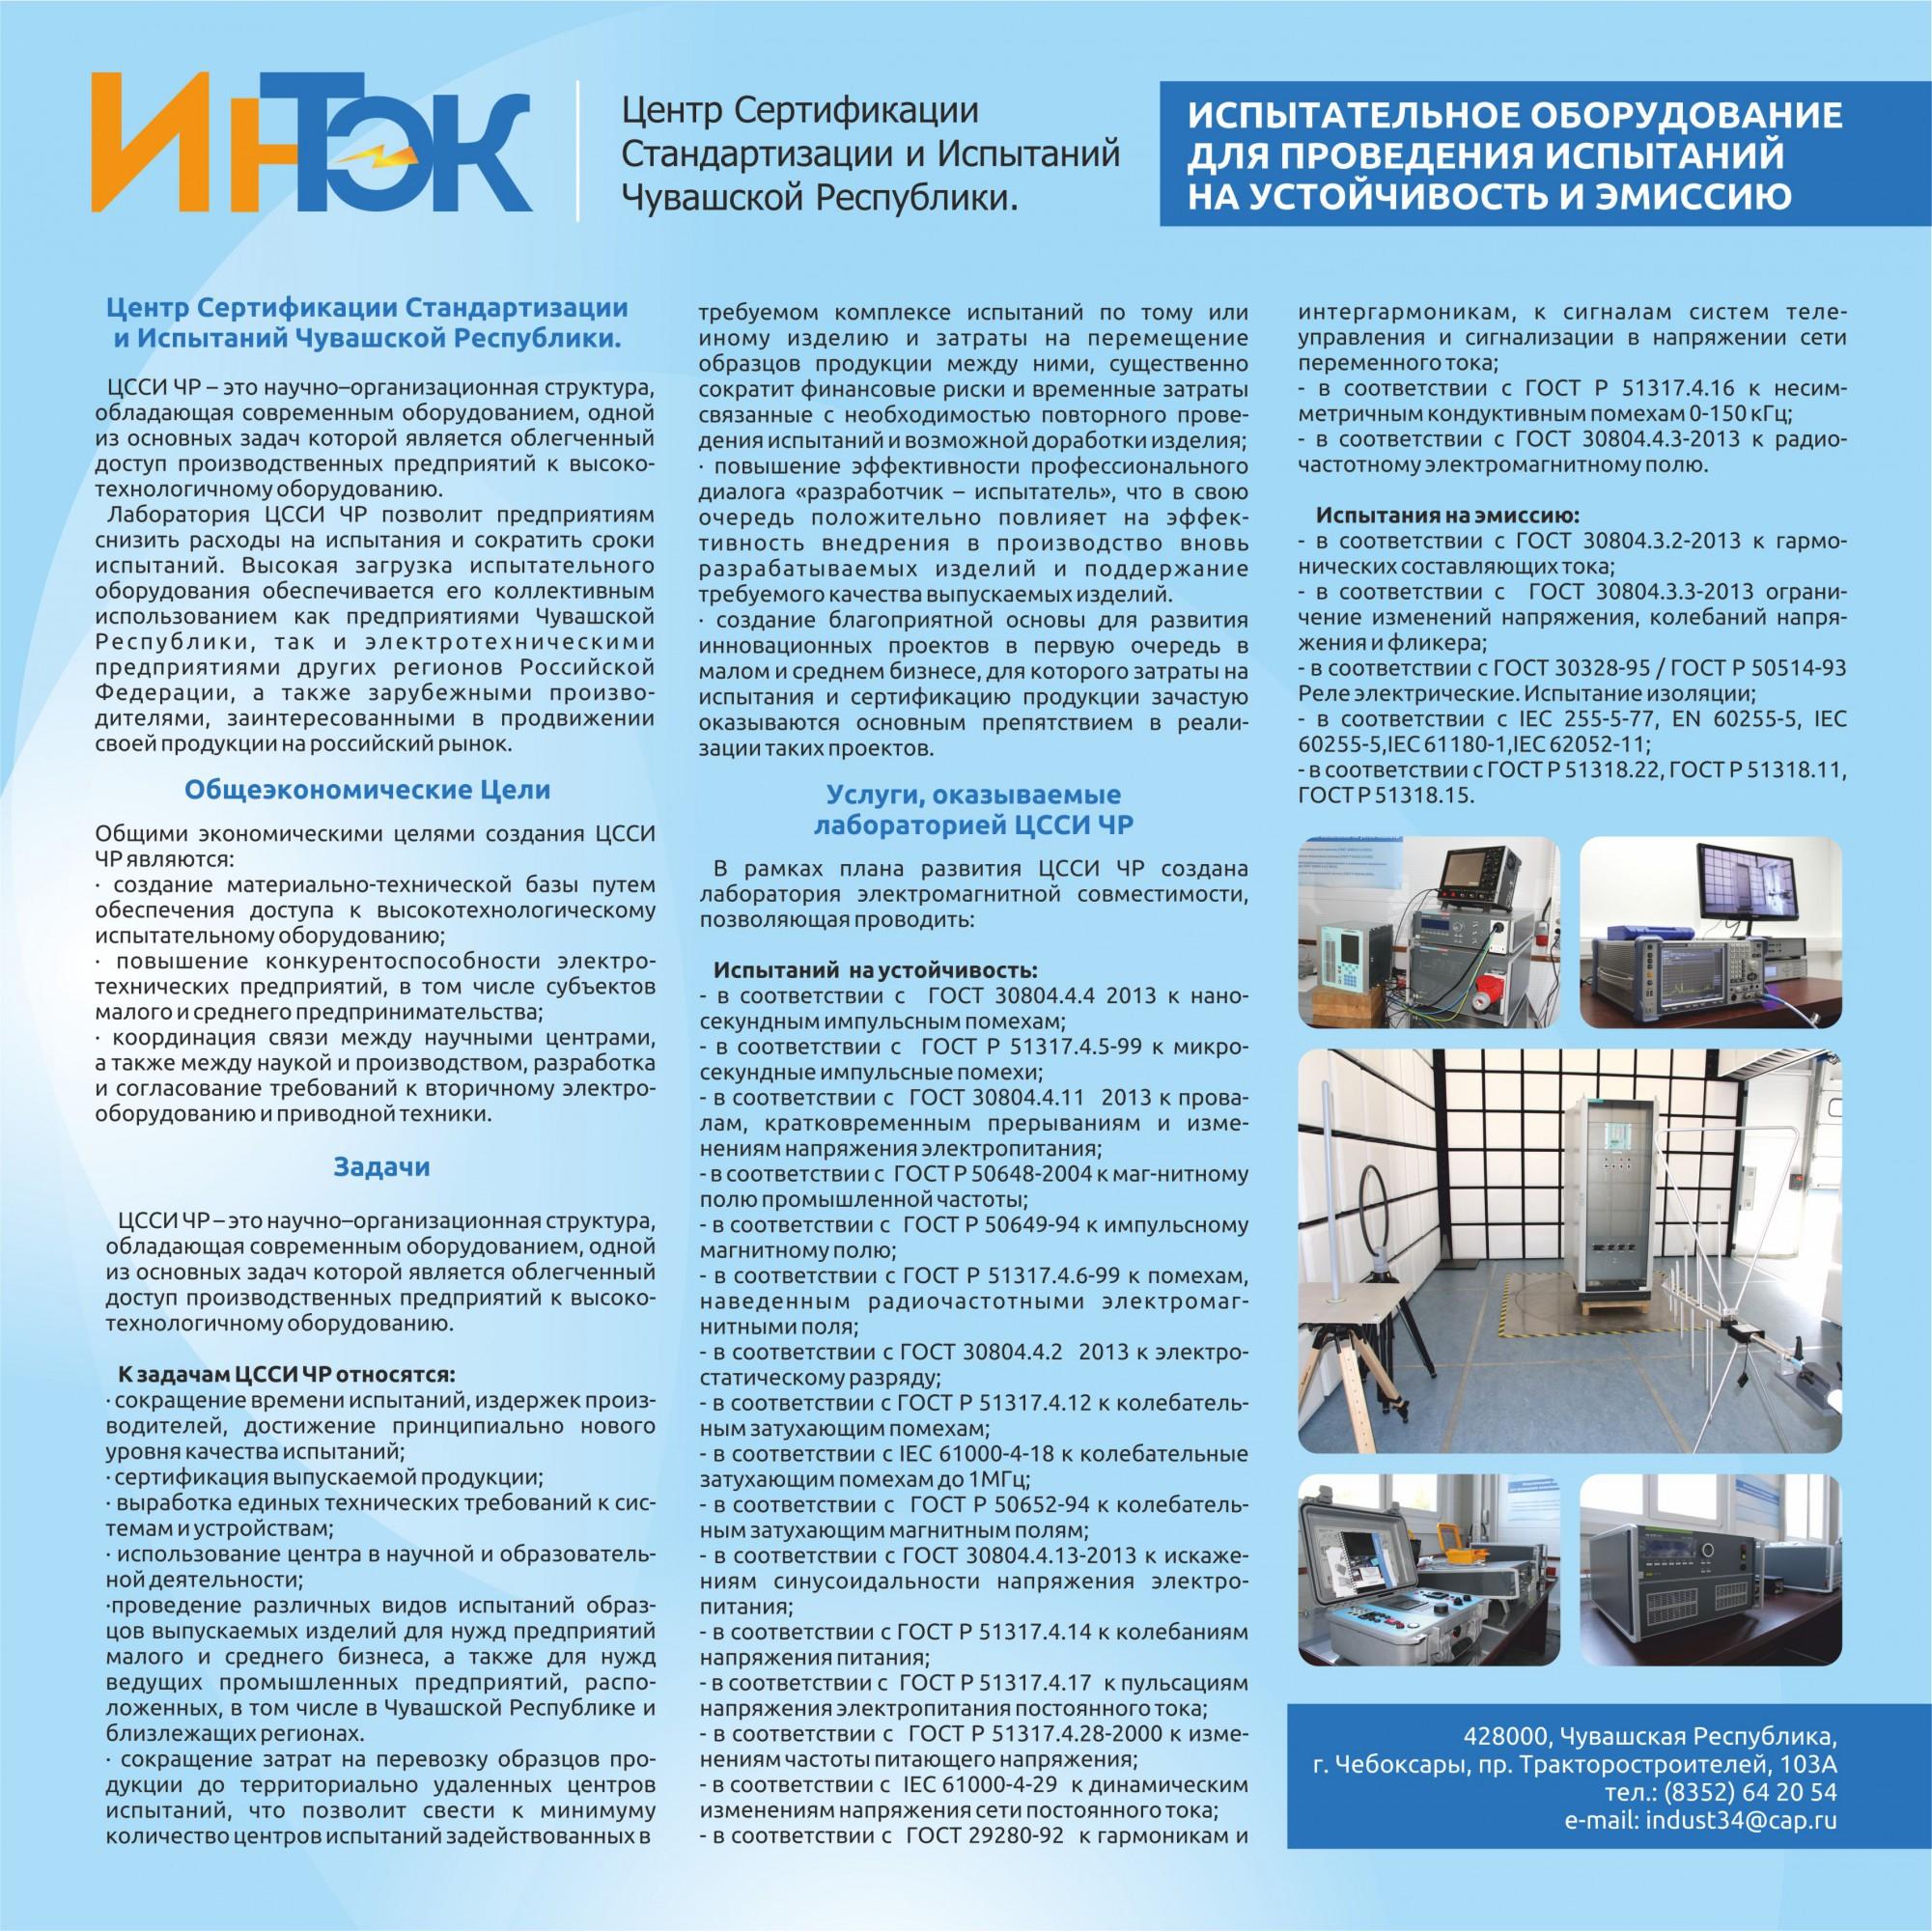 Centr_sertifikacii_CSSI-1441214664-0